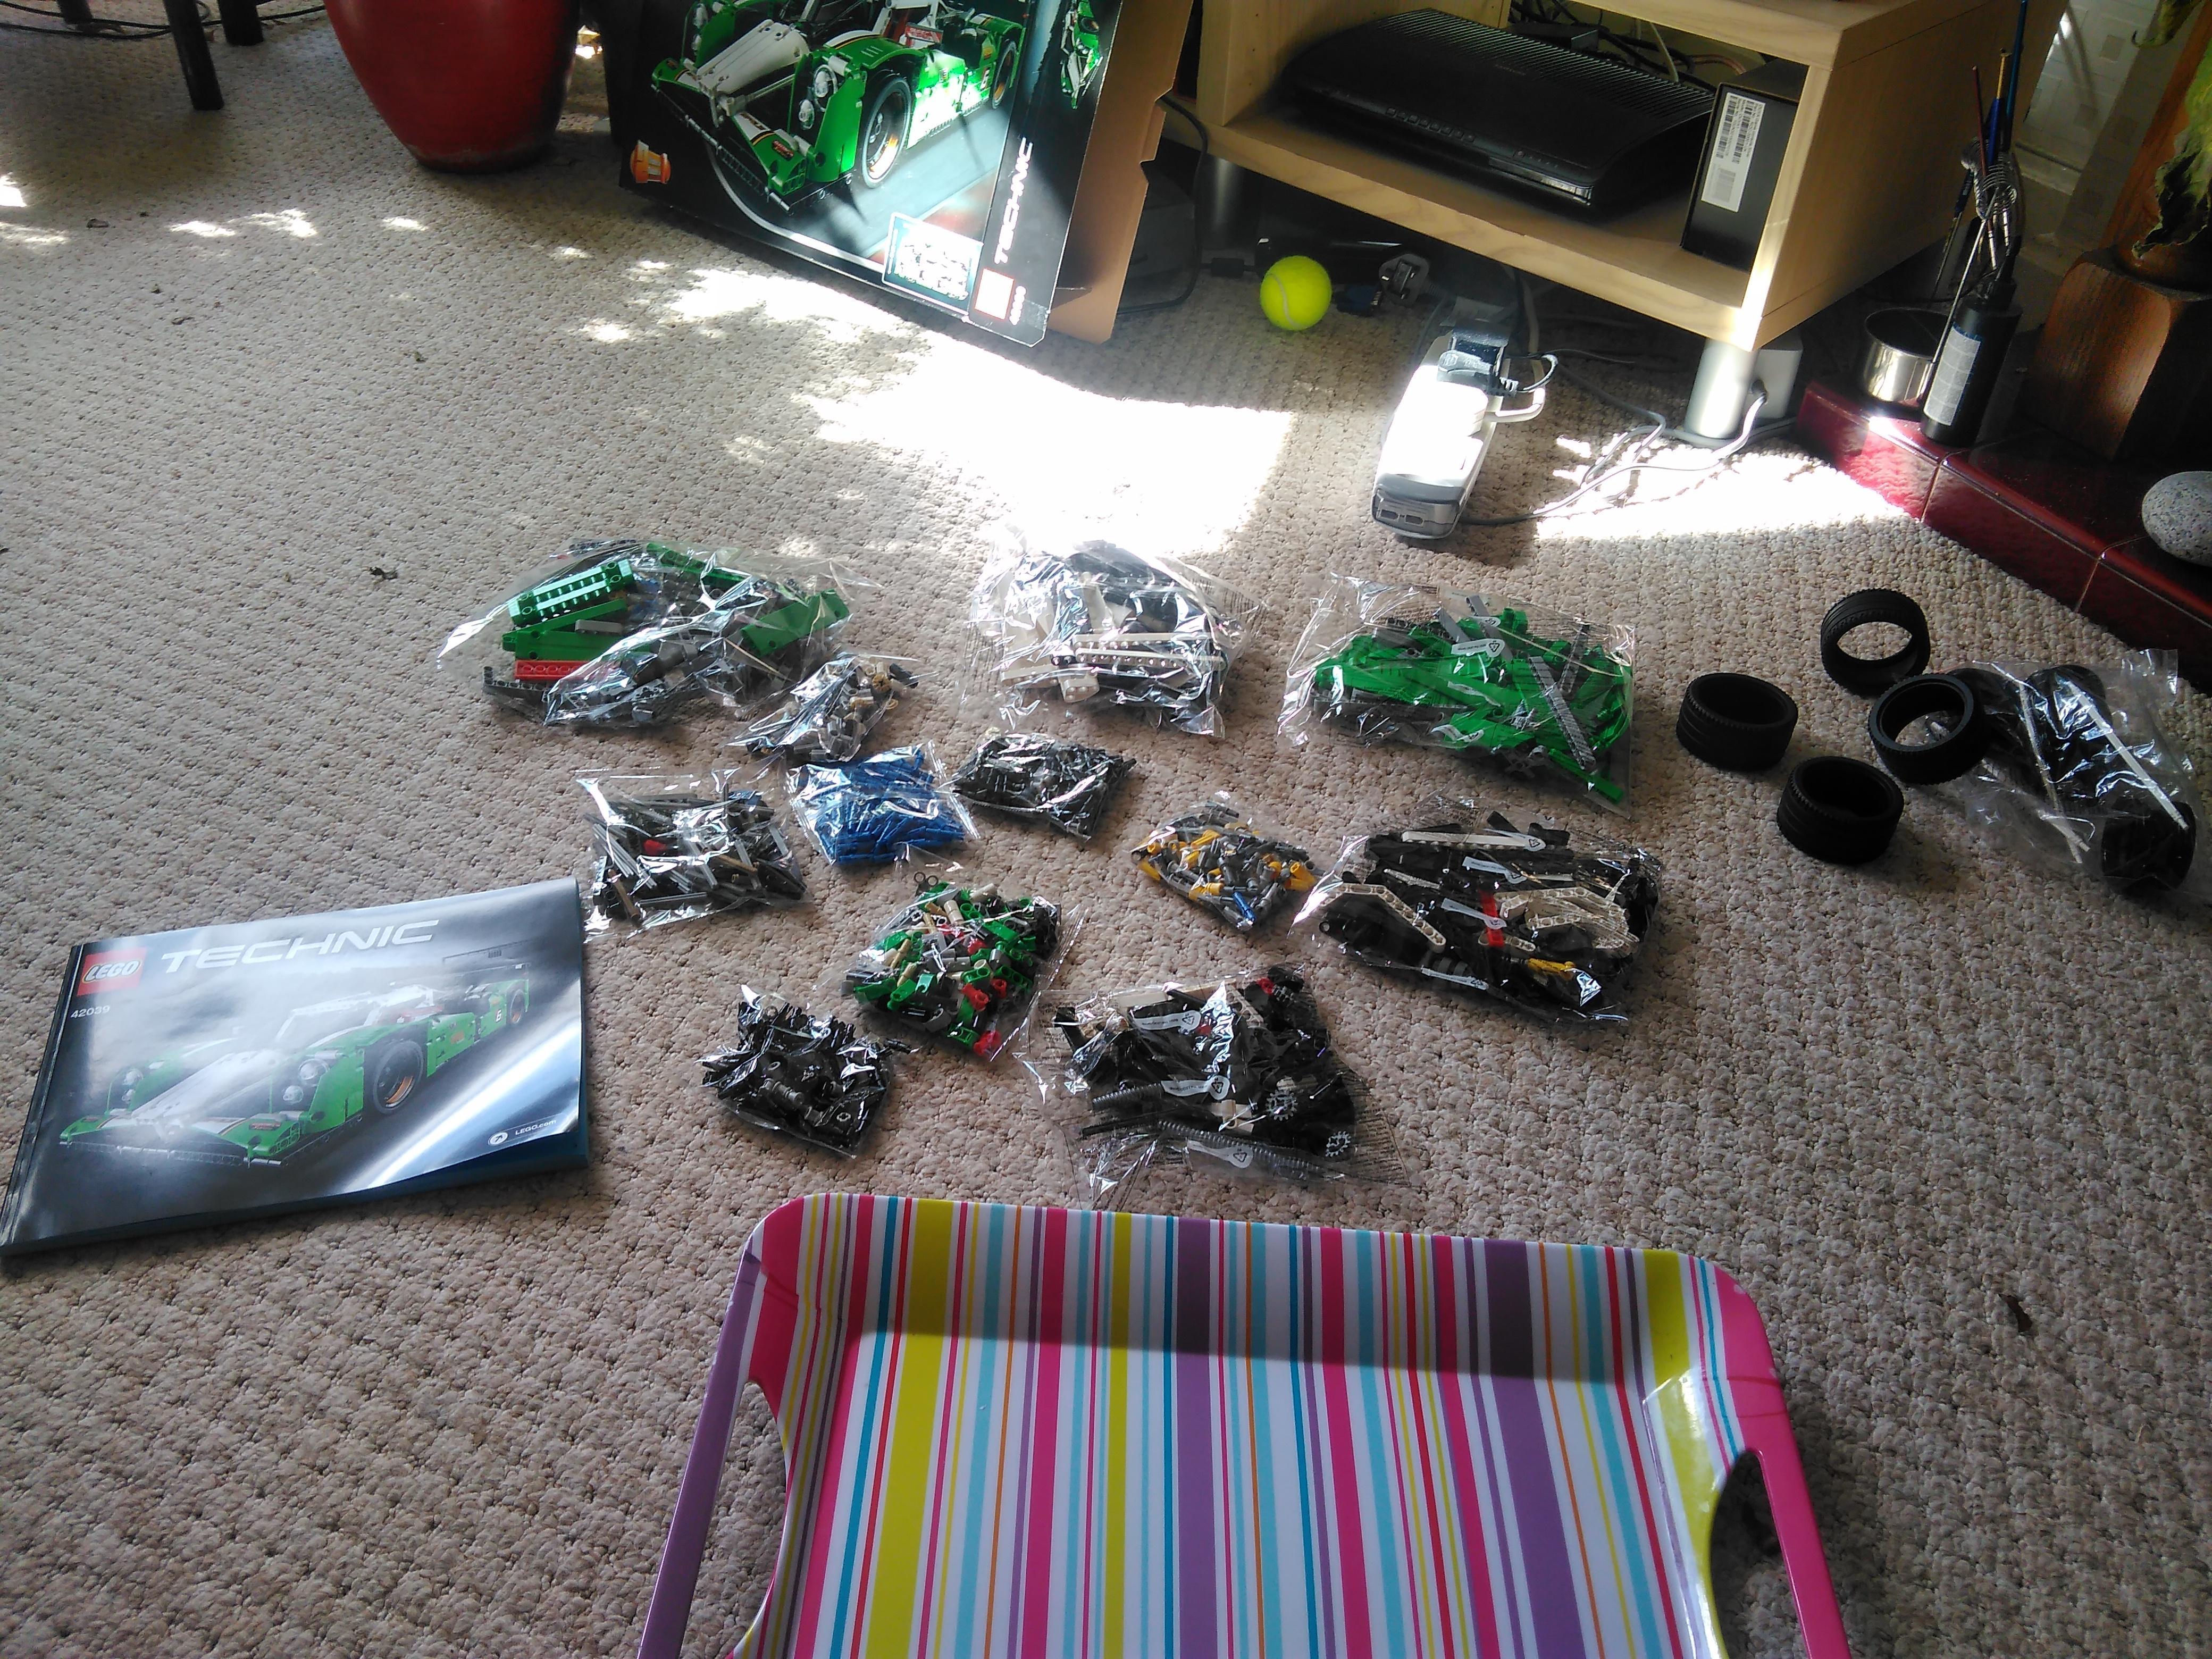 Lego Technic 24 Hours Race Car ready to build